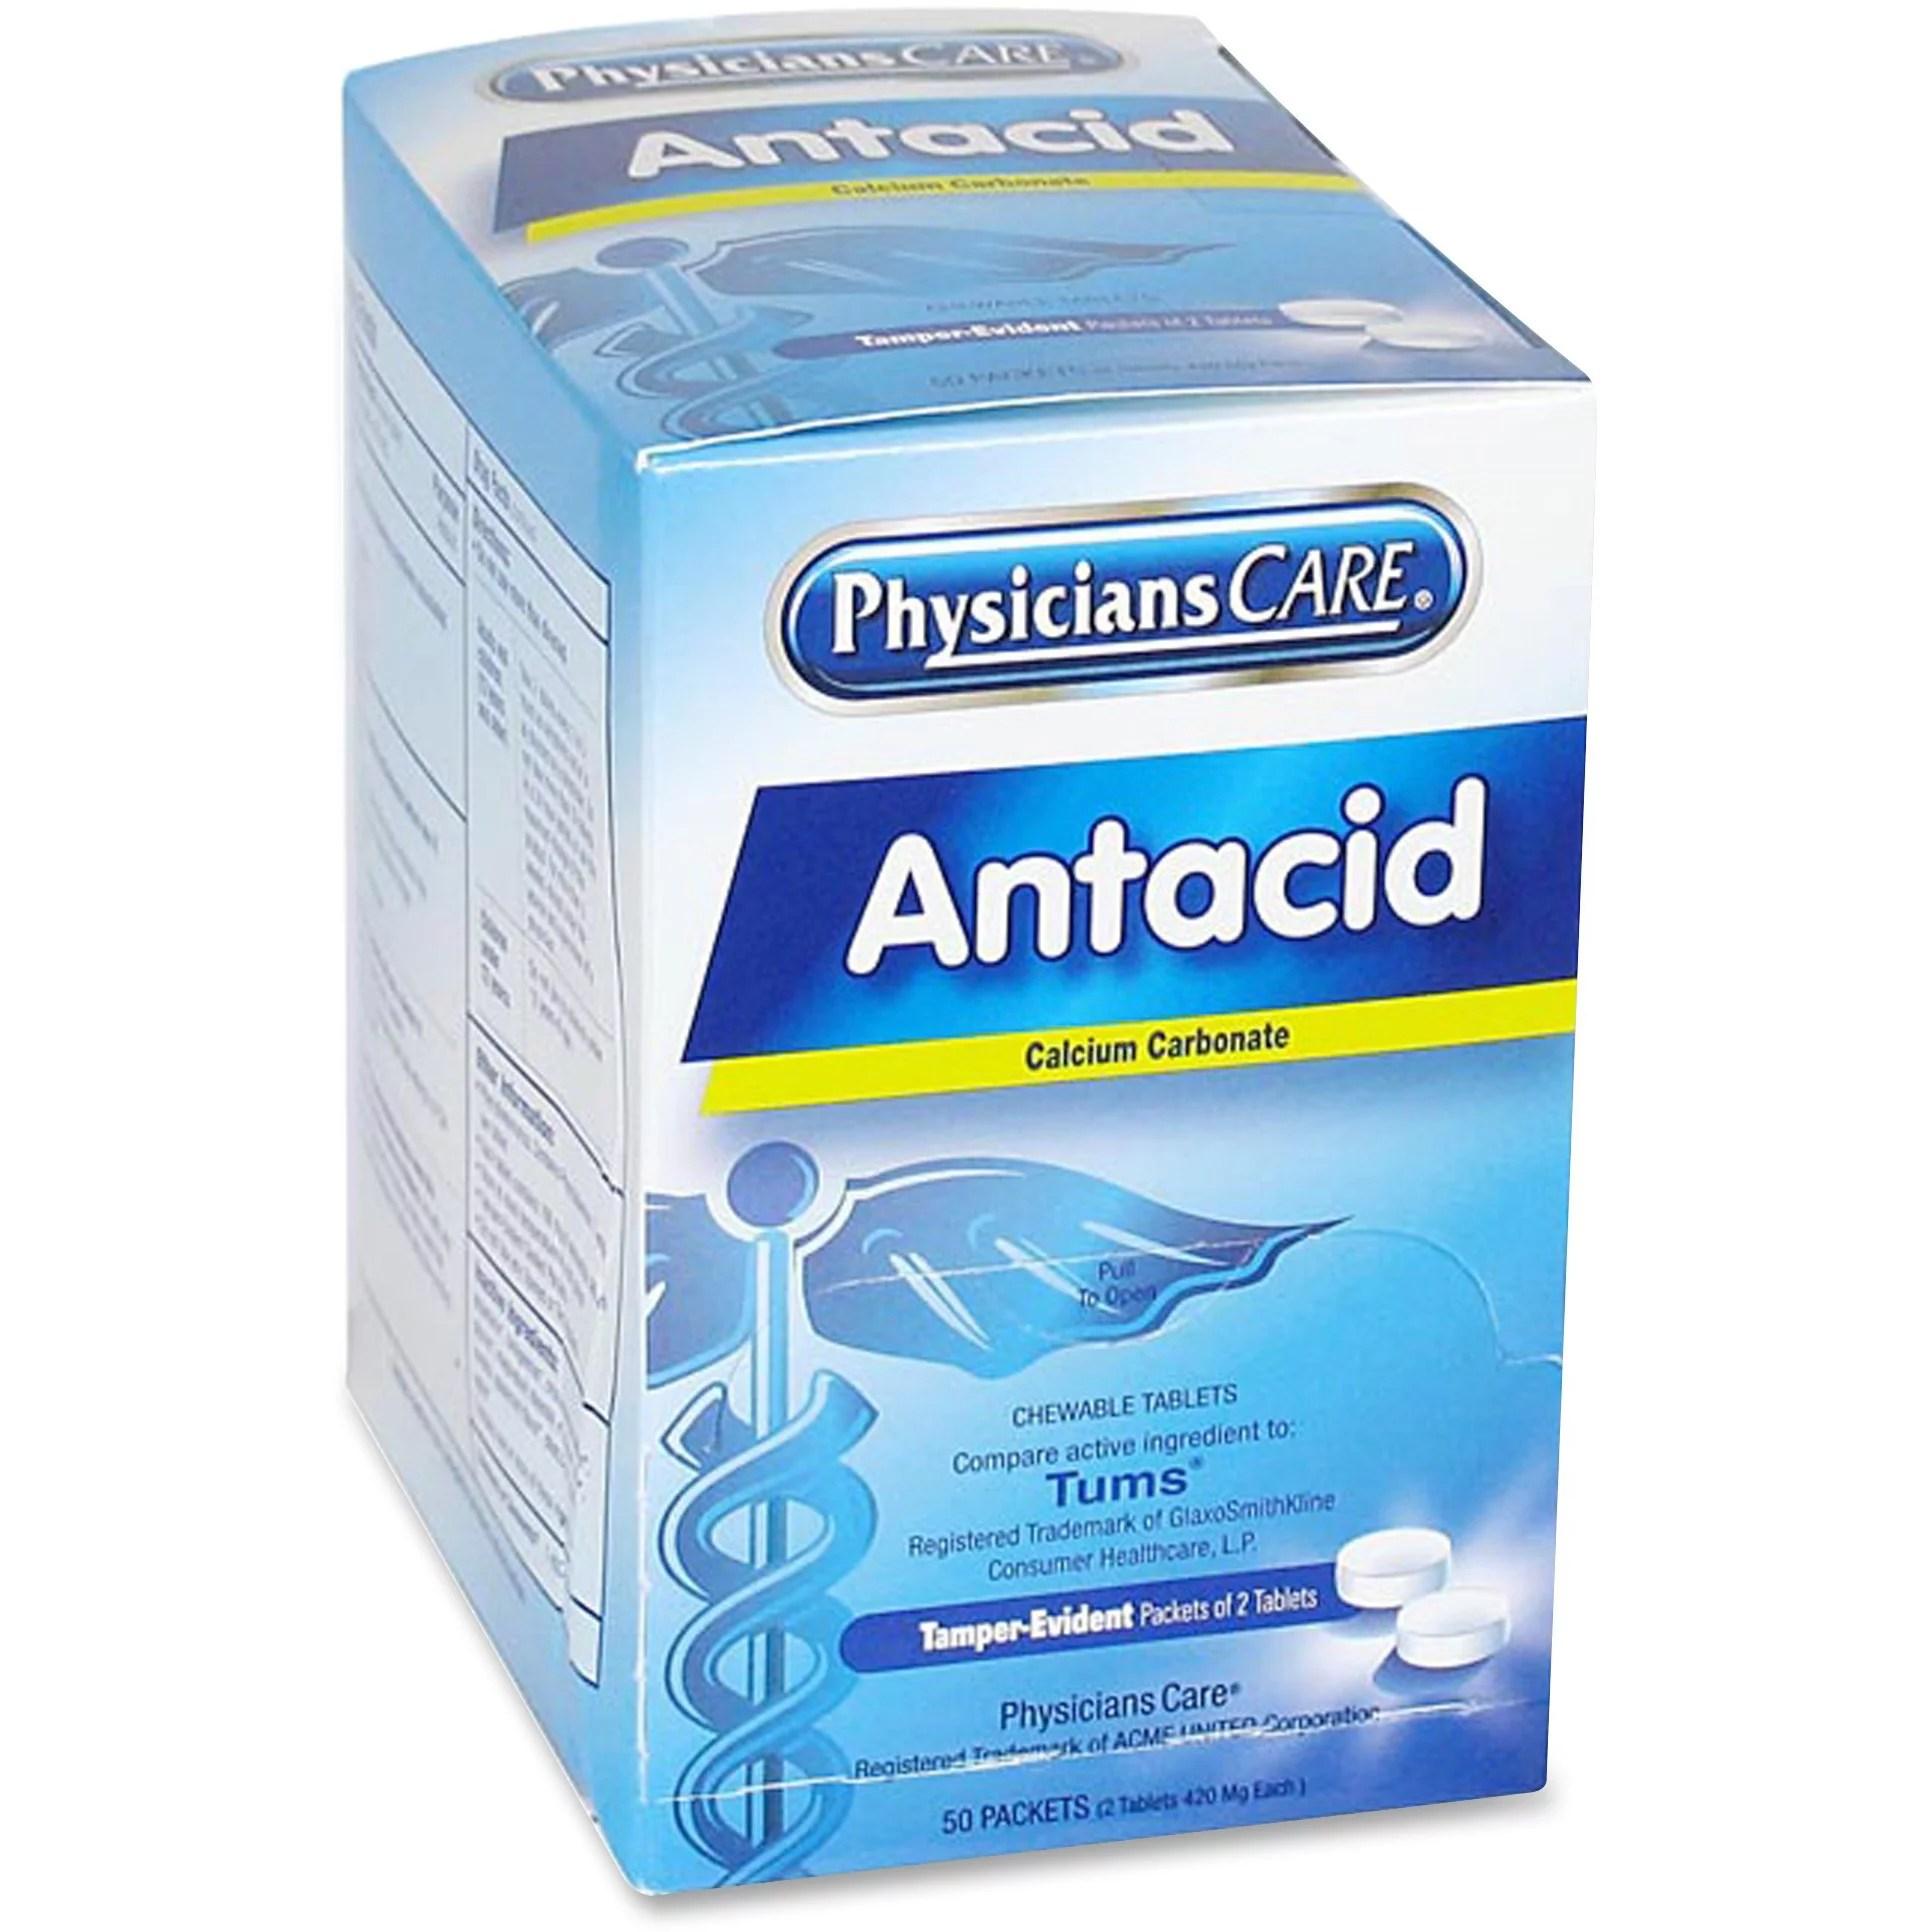 PhysiciansCare ACM90089 Antacid Medication Tablets 50 ...